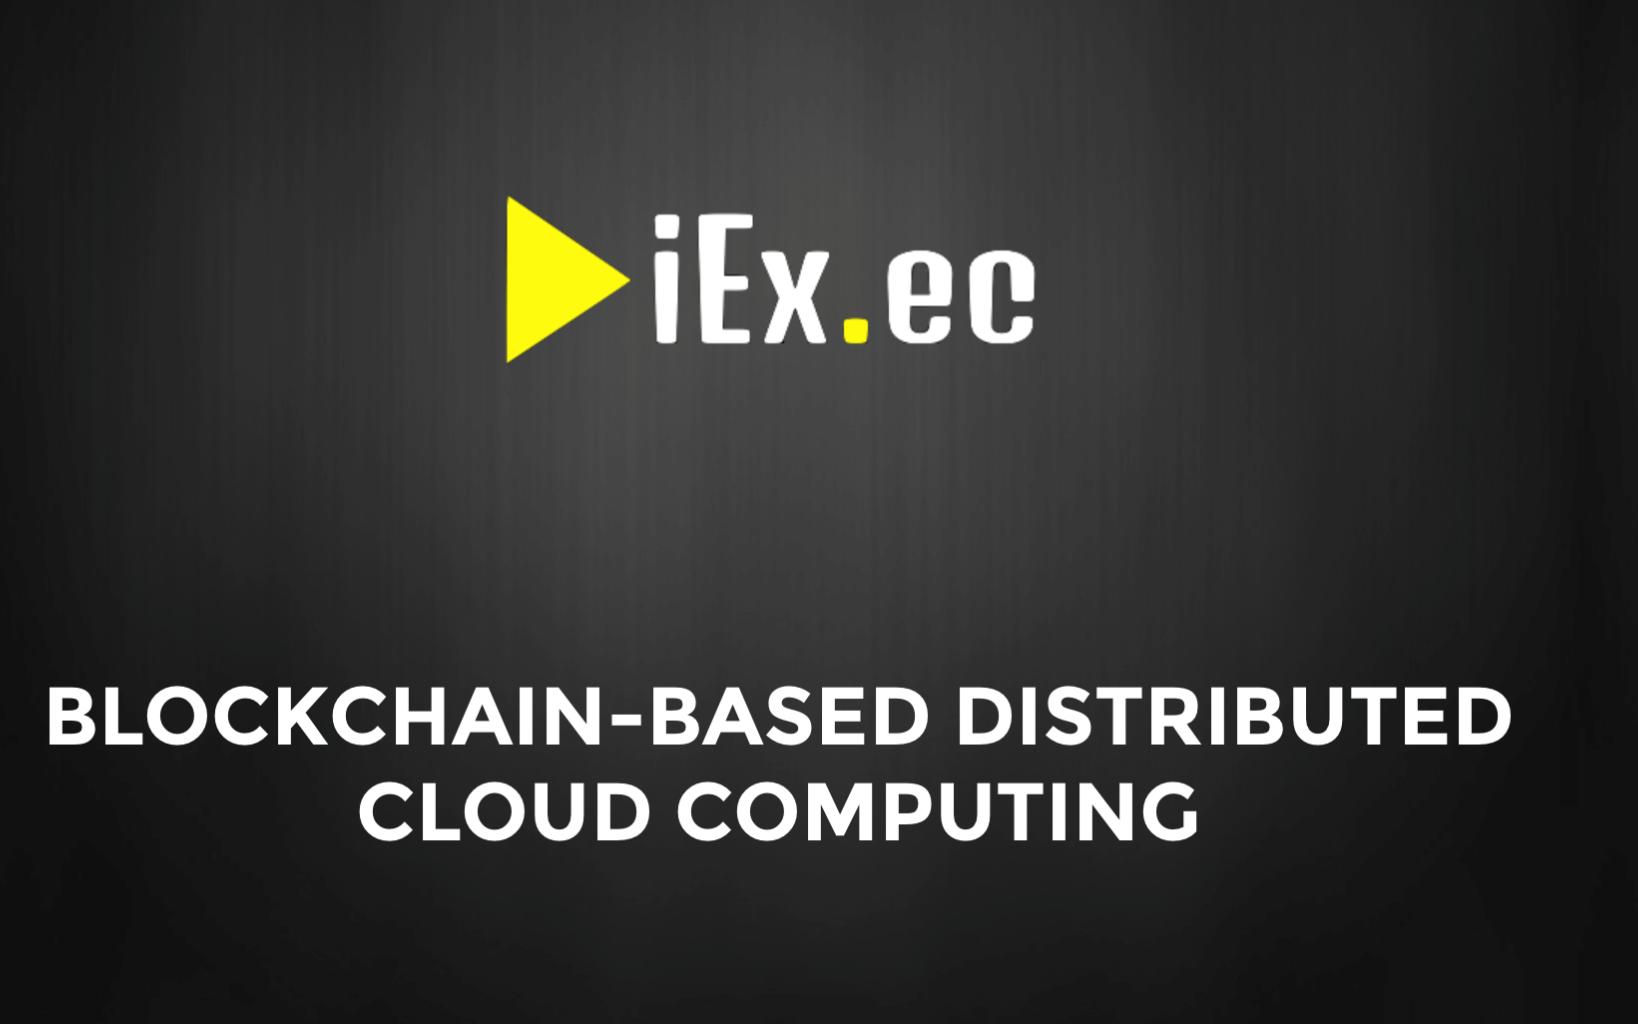 Bitcoin PR Buzz iEx.ec Blockchain Cloud Whitepaper